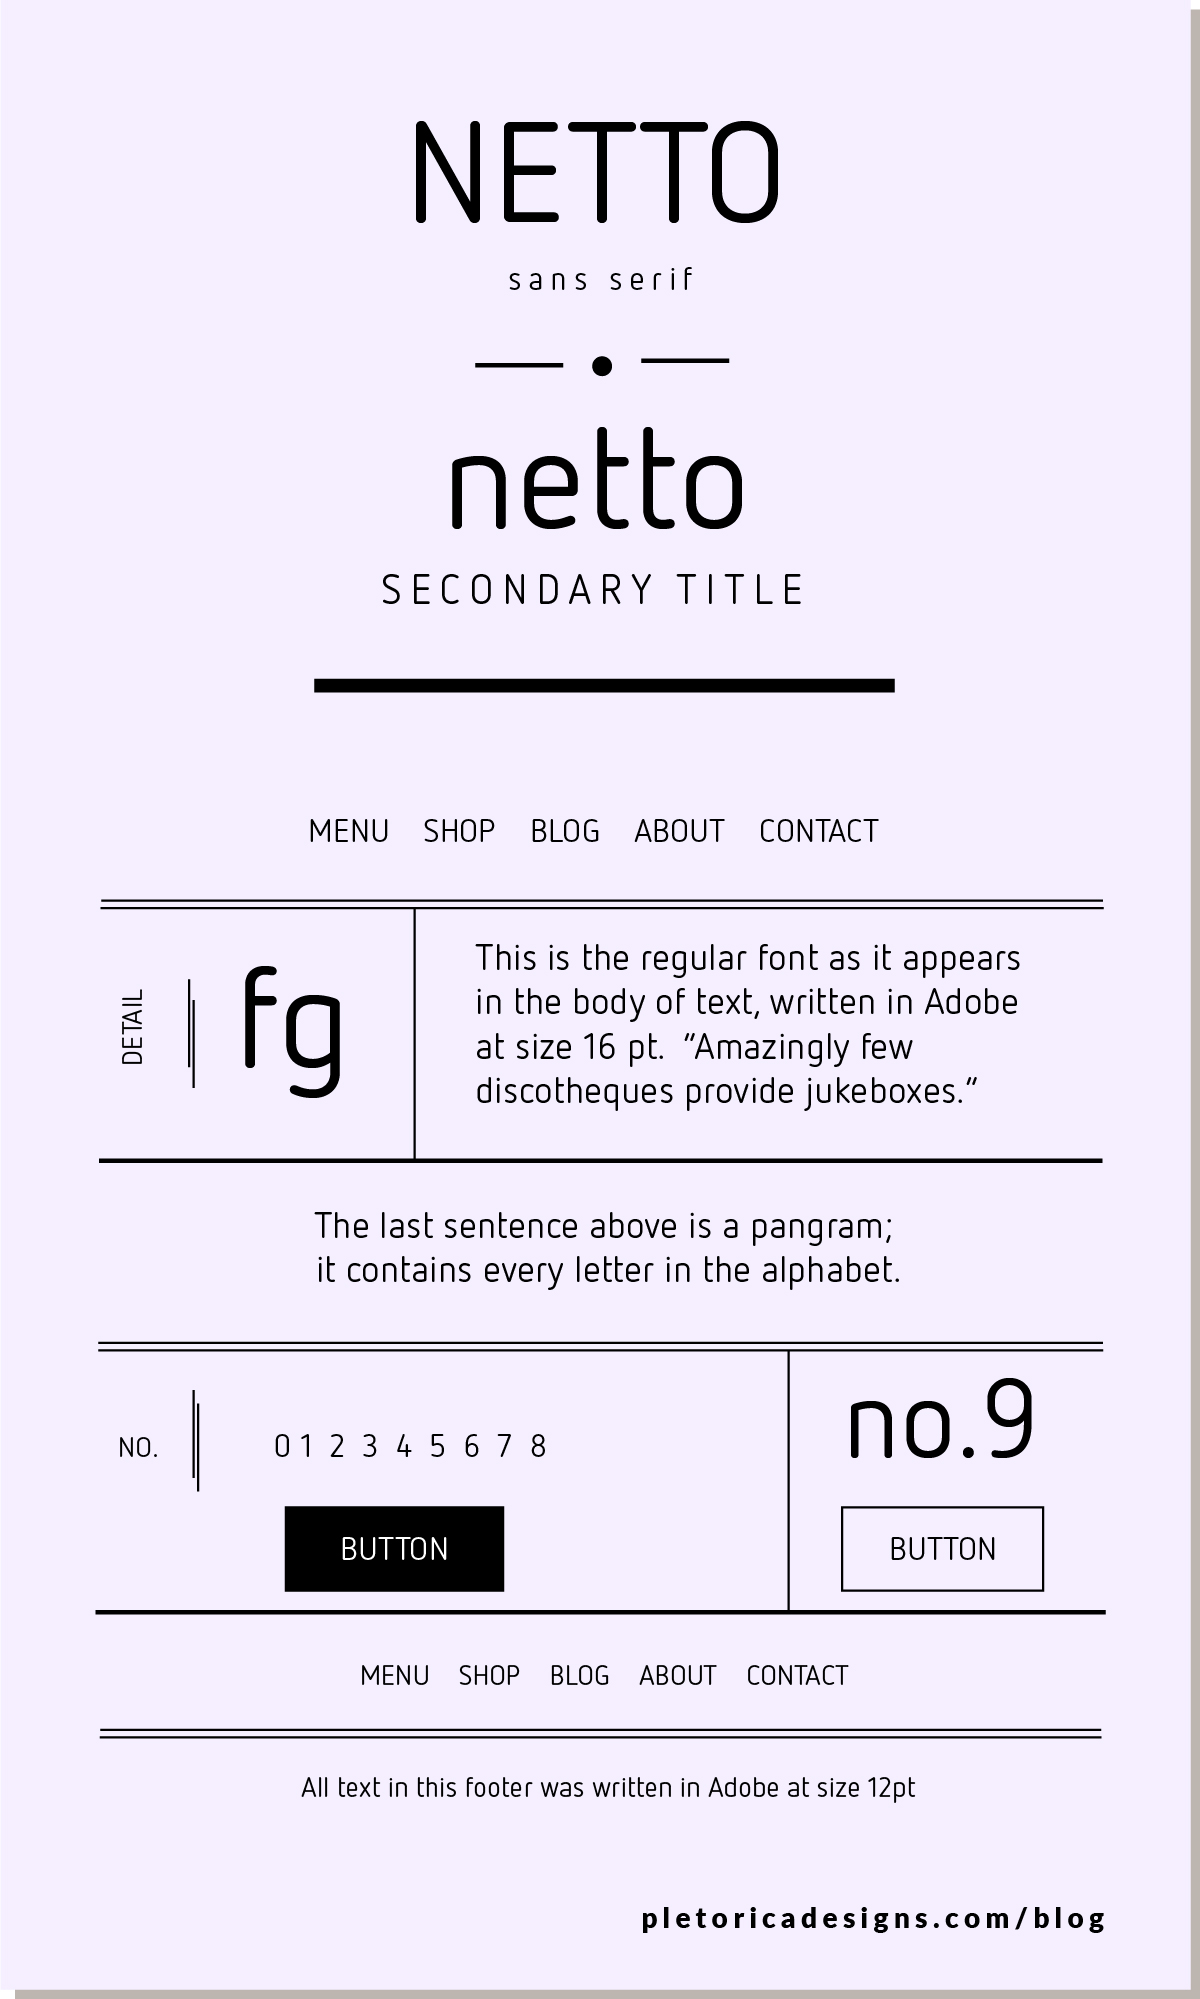 LET'S TYPE: Netto — PLETÓRICA DESIGNS